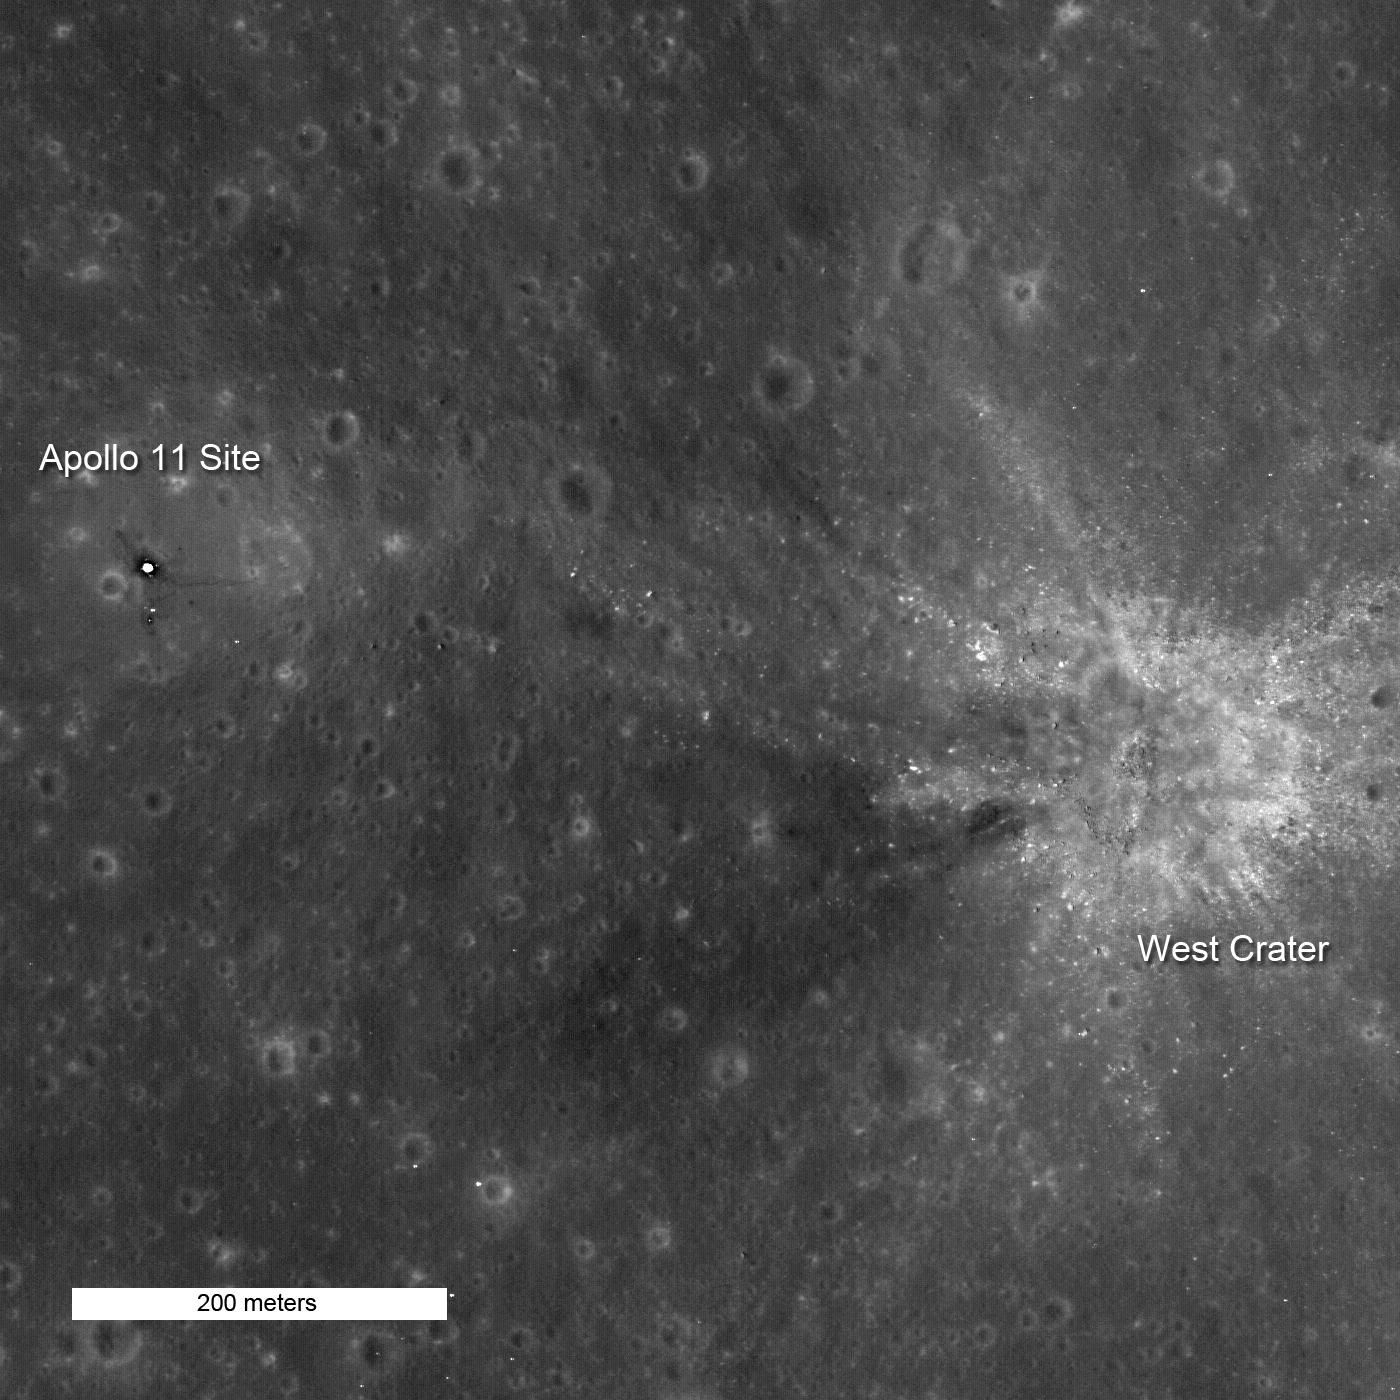 apollo tracks on moon - photo #18